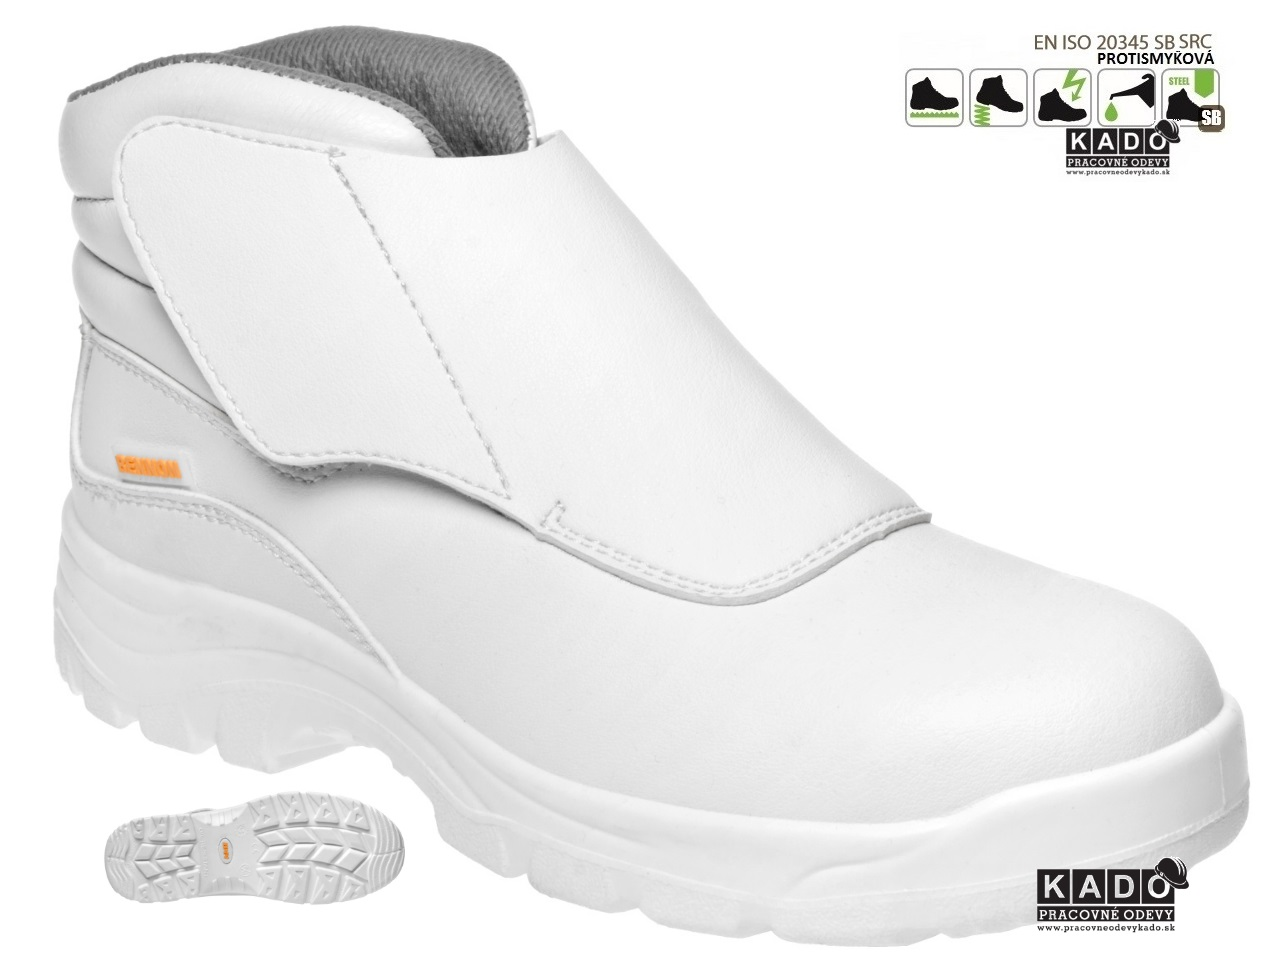 c7072eb447 Bezpečnostná obuv BENNON WHITE S2 HIGH